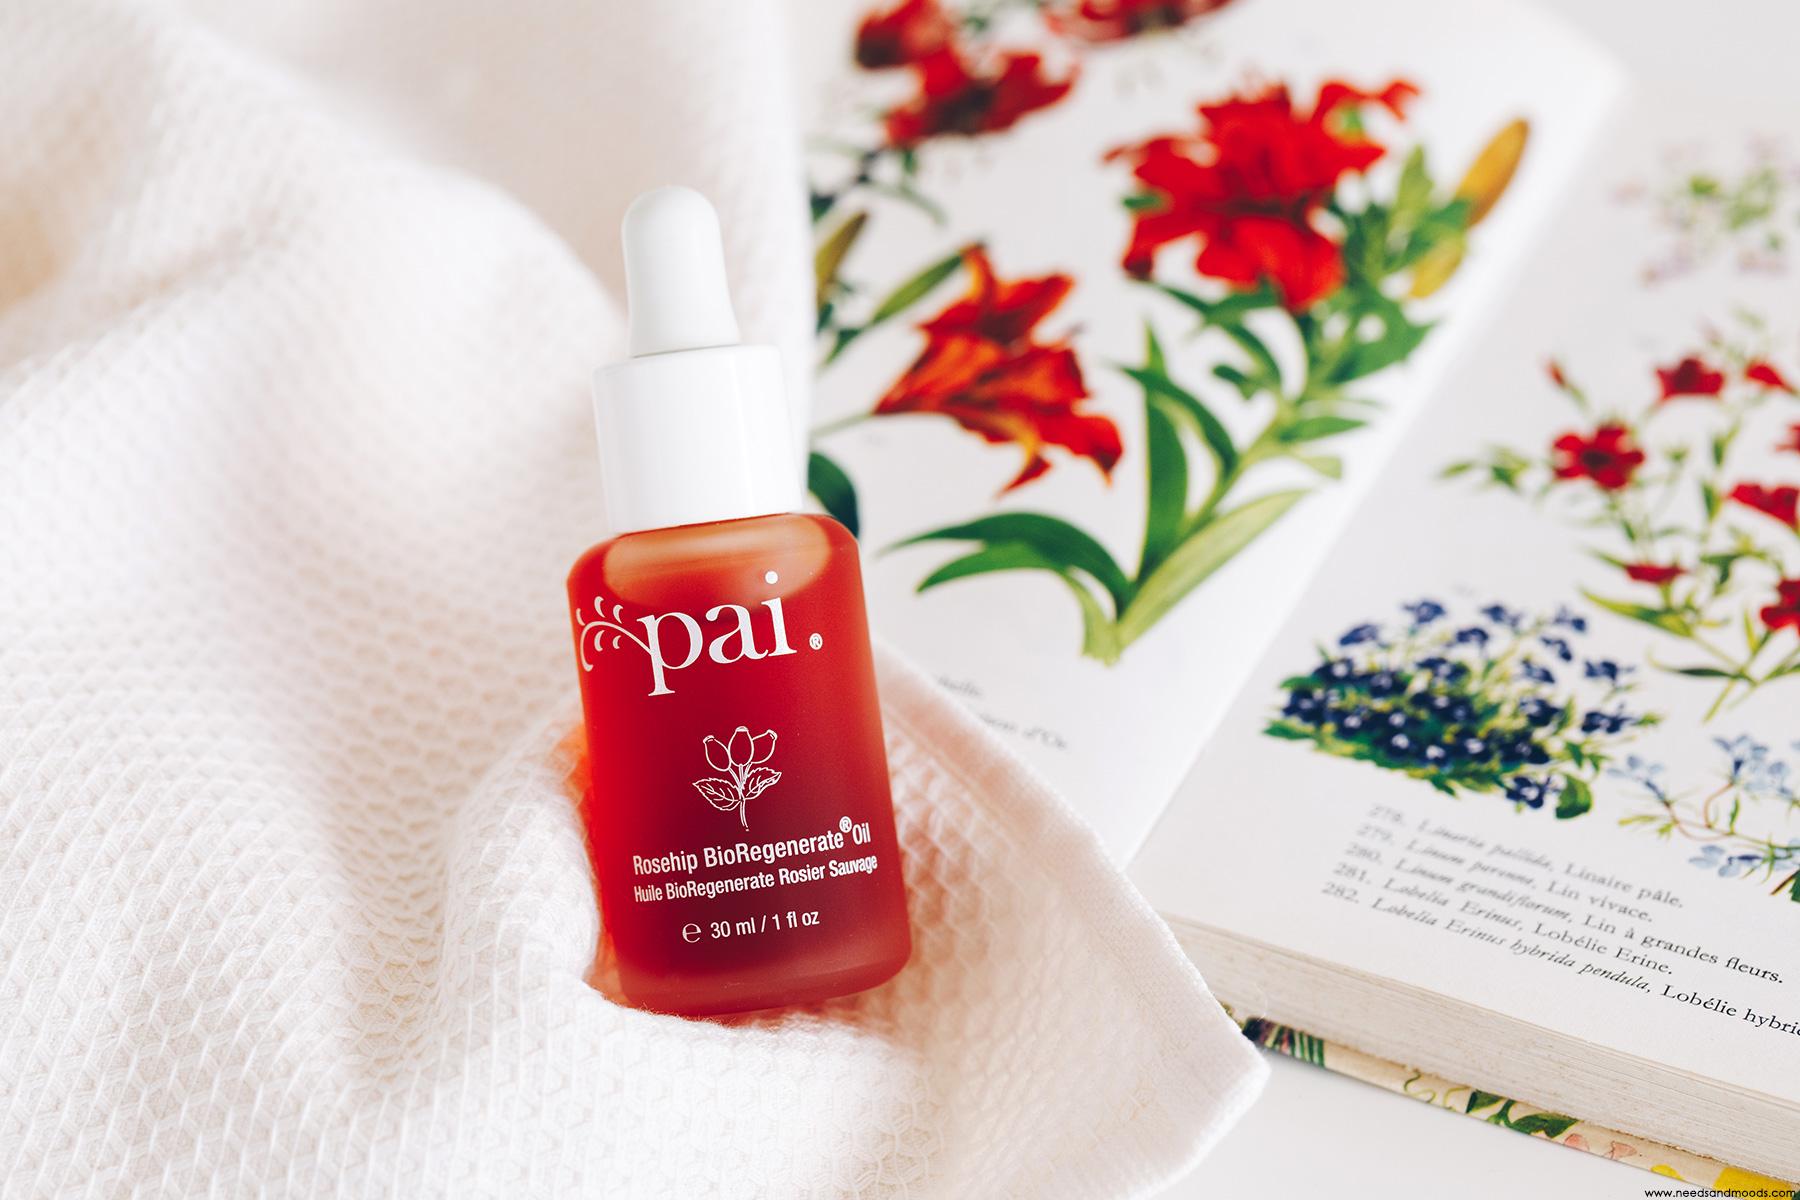 pai skincare huile bioregenerate rosier sauvage pai